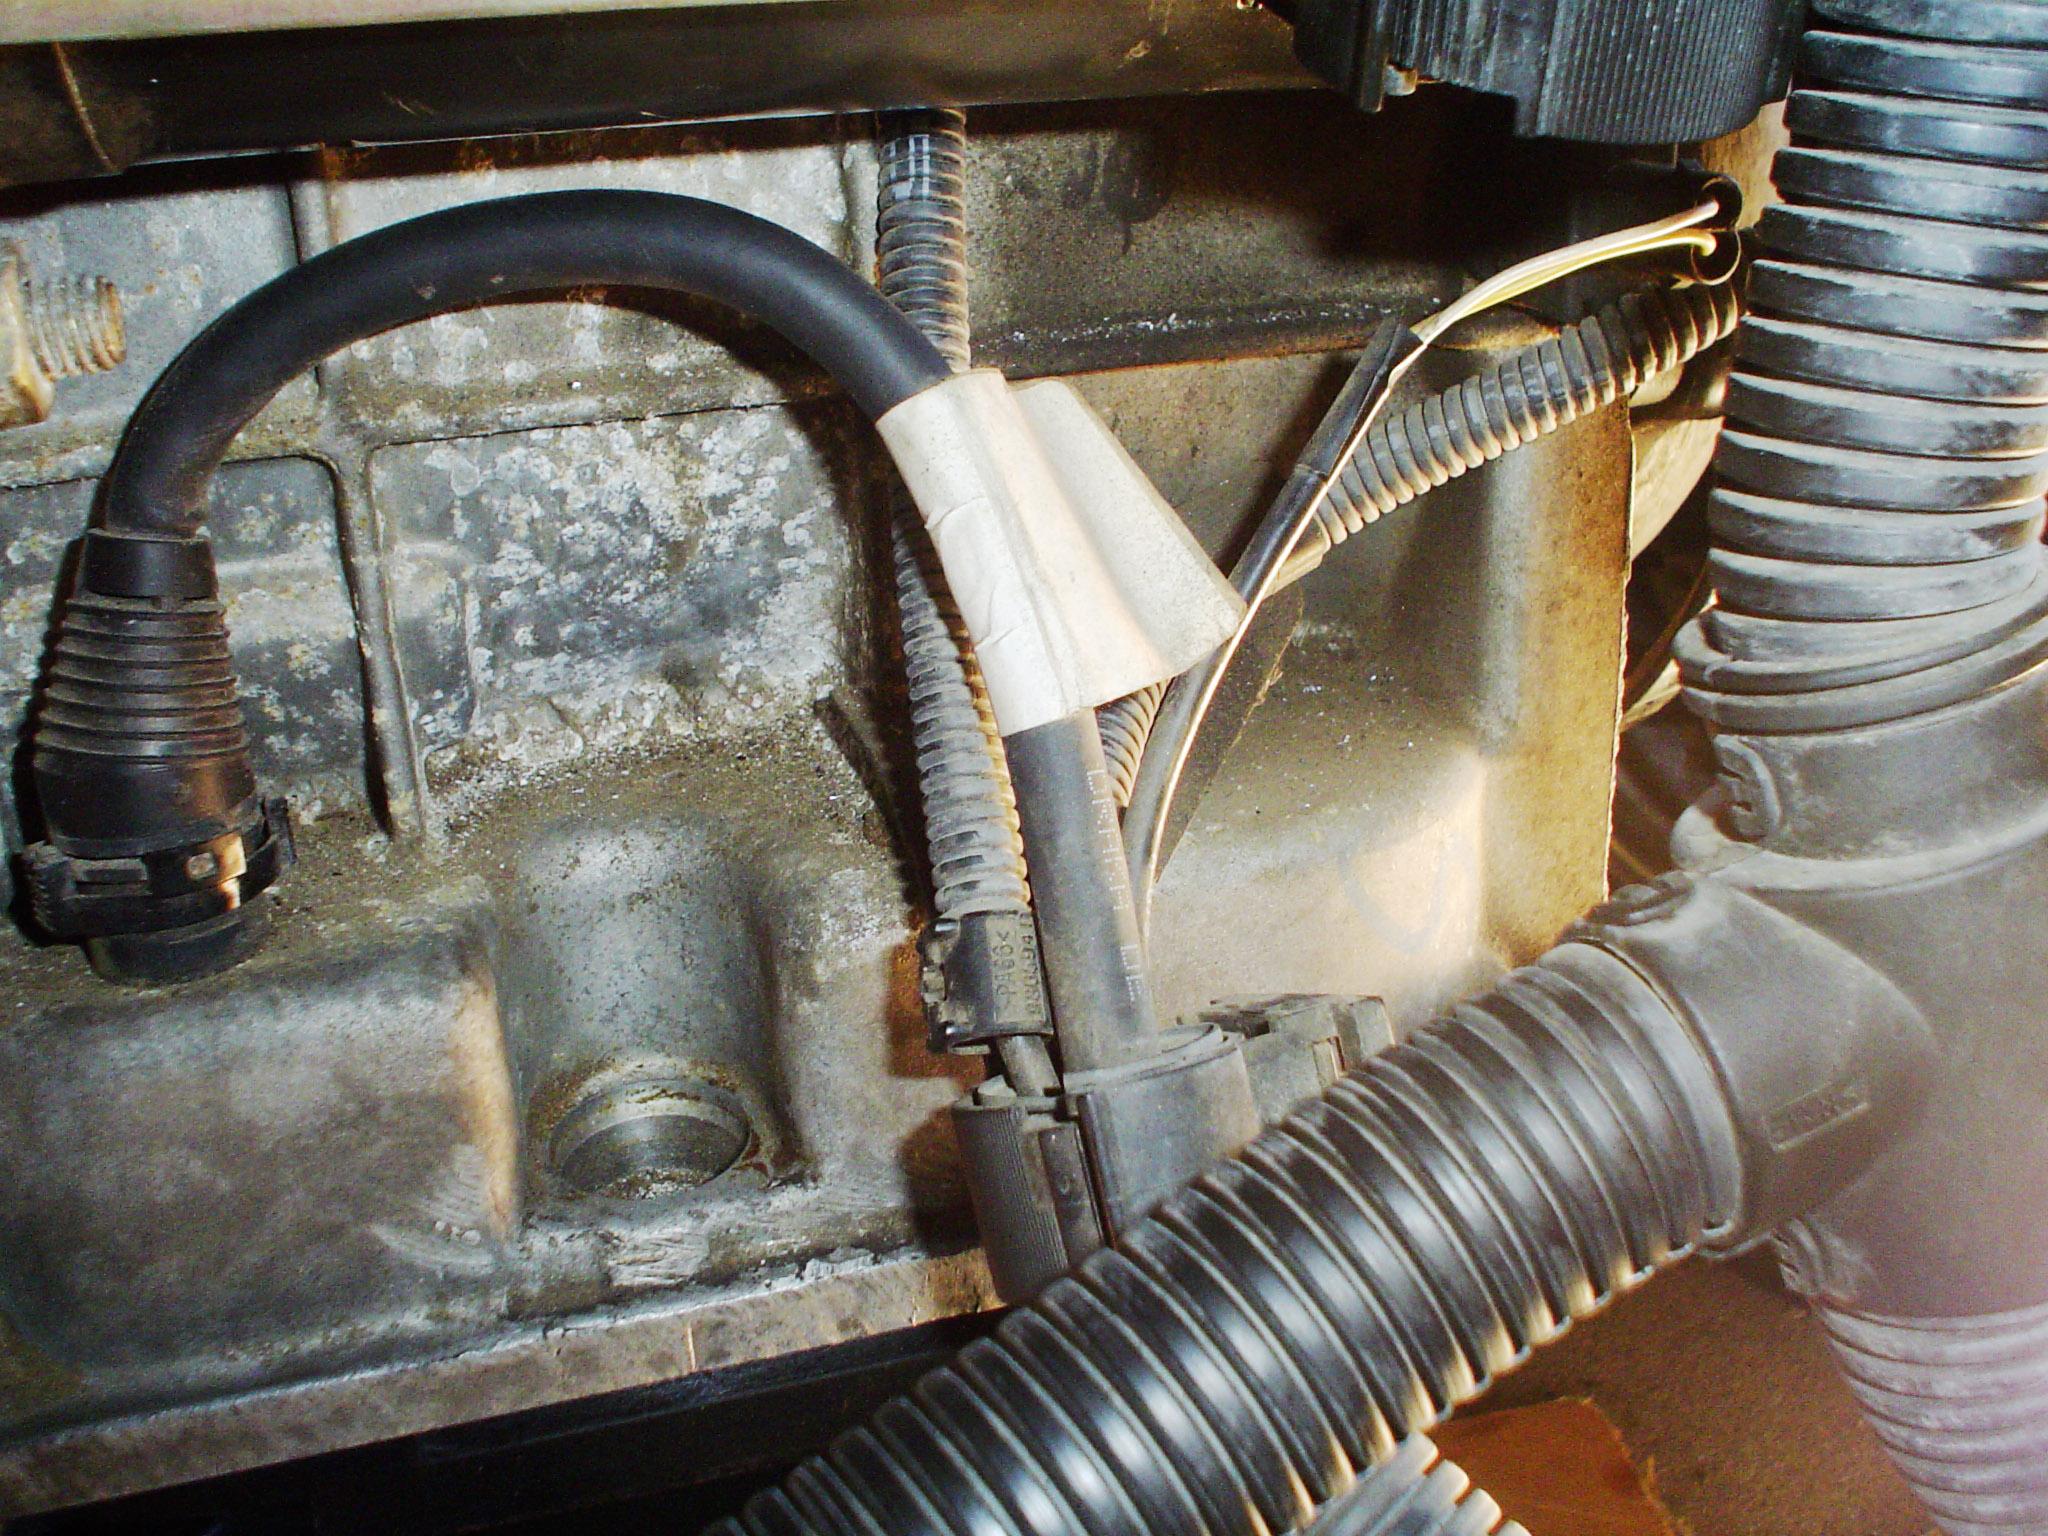 100 repair manual 01p thesamba eurovan view topic you it u0027s 01p